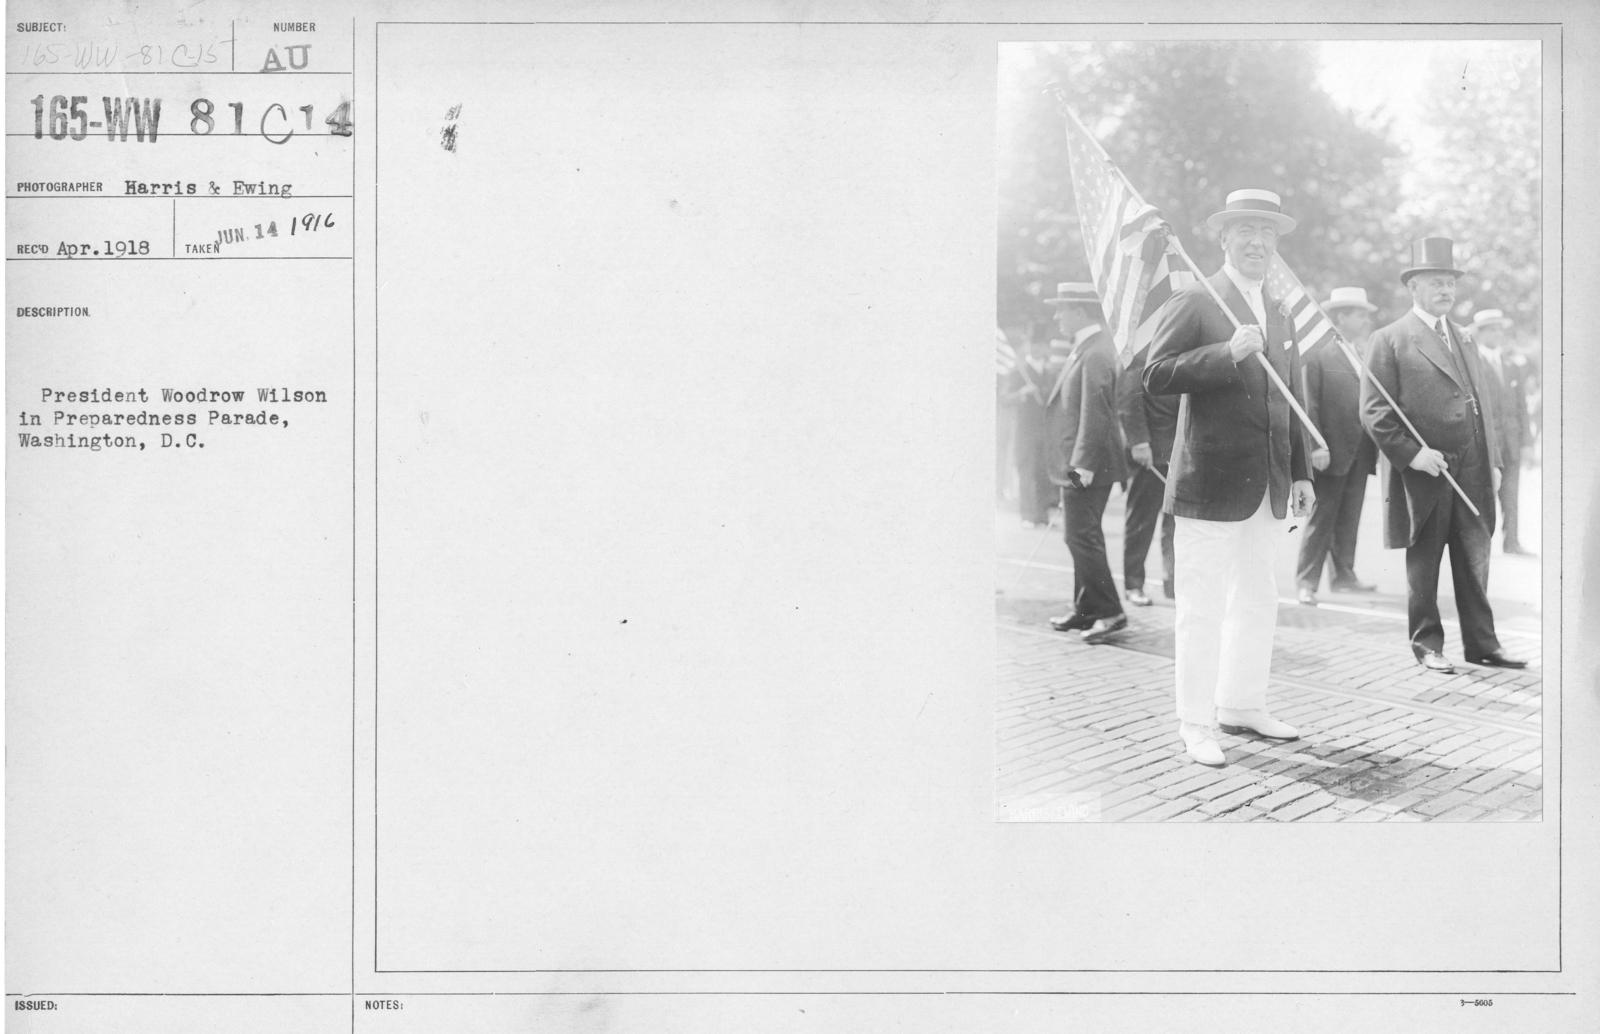 Ceremonies - Preparedness Day, Washington, D.C. - President Woodrow Wilson in Preparedness Parade, Washington, D.C